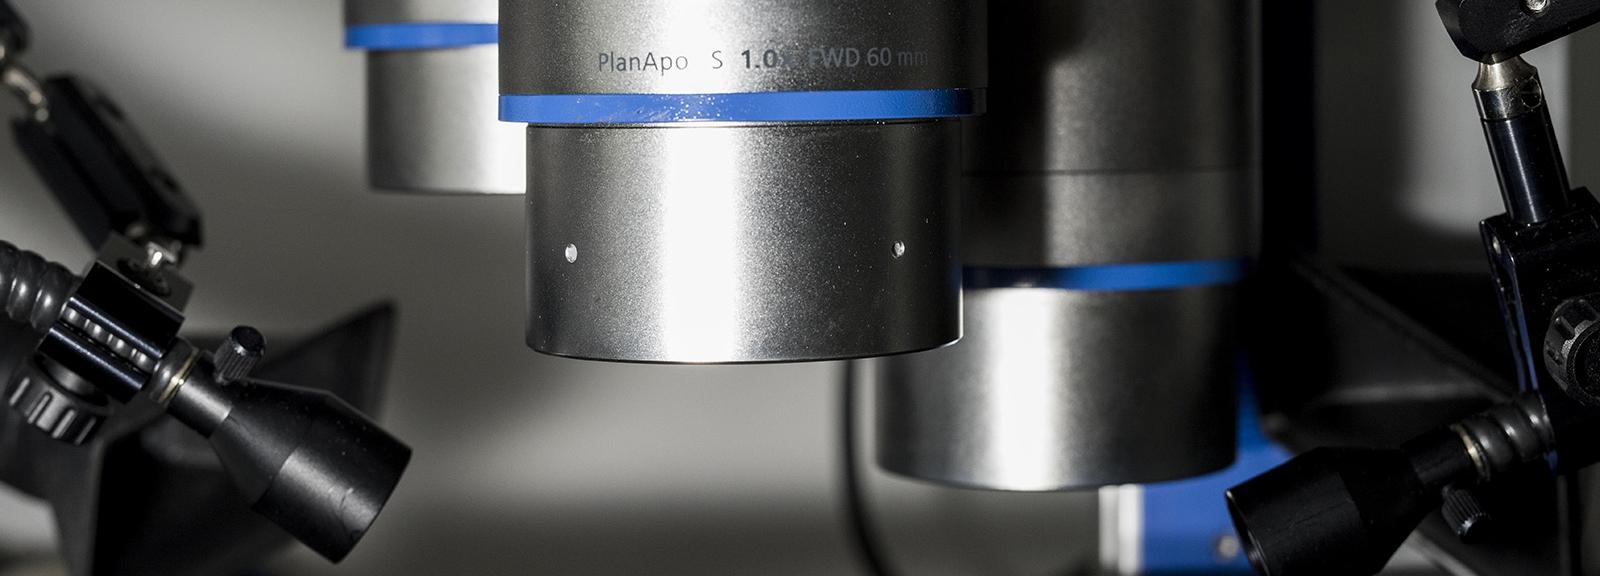 Microscope stéréoscopique - Station marine de Concarneau © MNHN - Agnès Iatzoura